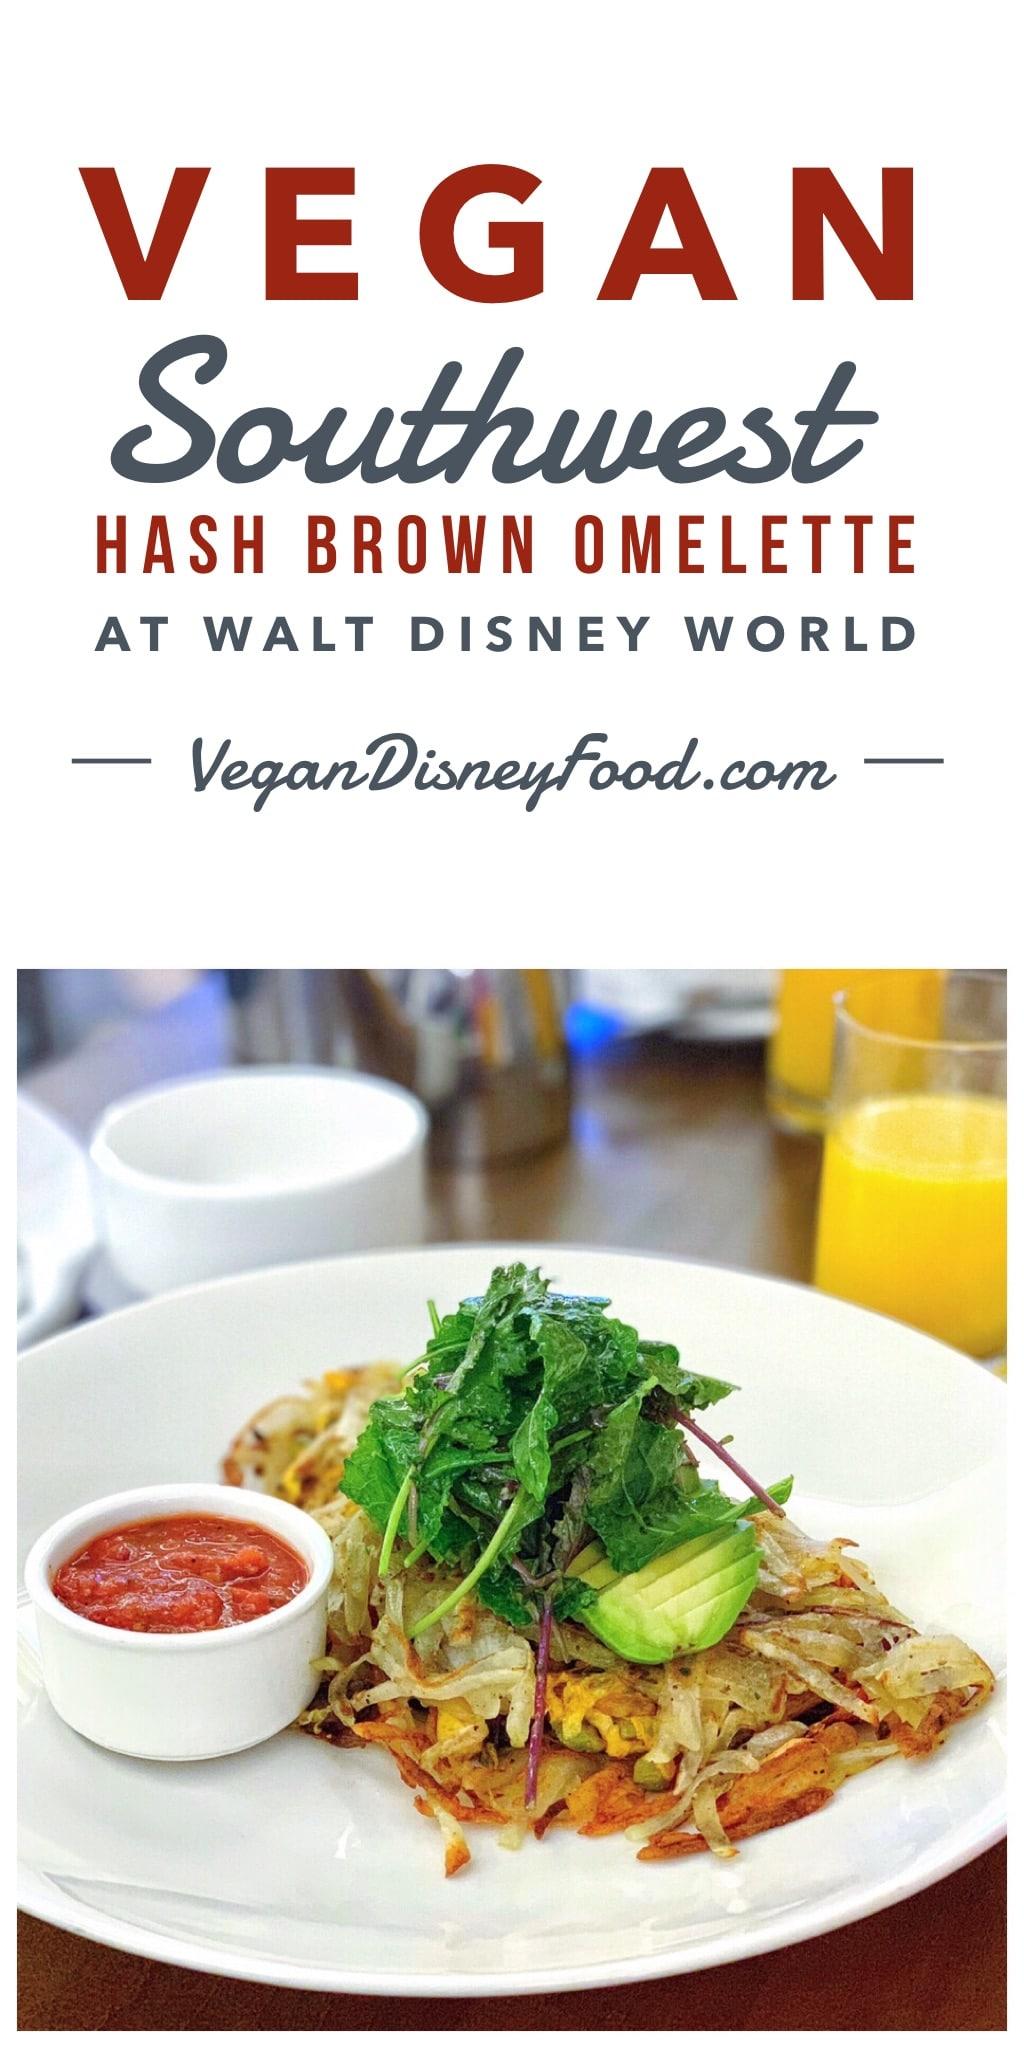 Vegan Southwest Hash Brown Omelette at the Waldorf Astoria Orlando in Walt Disney World